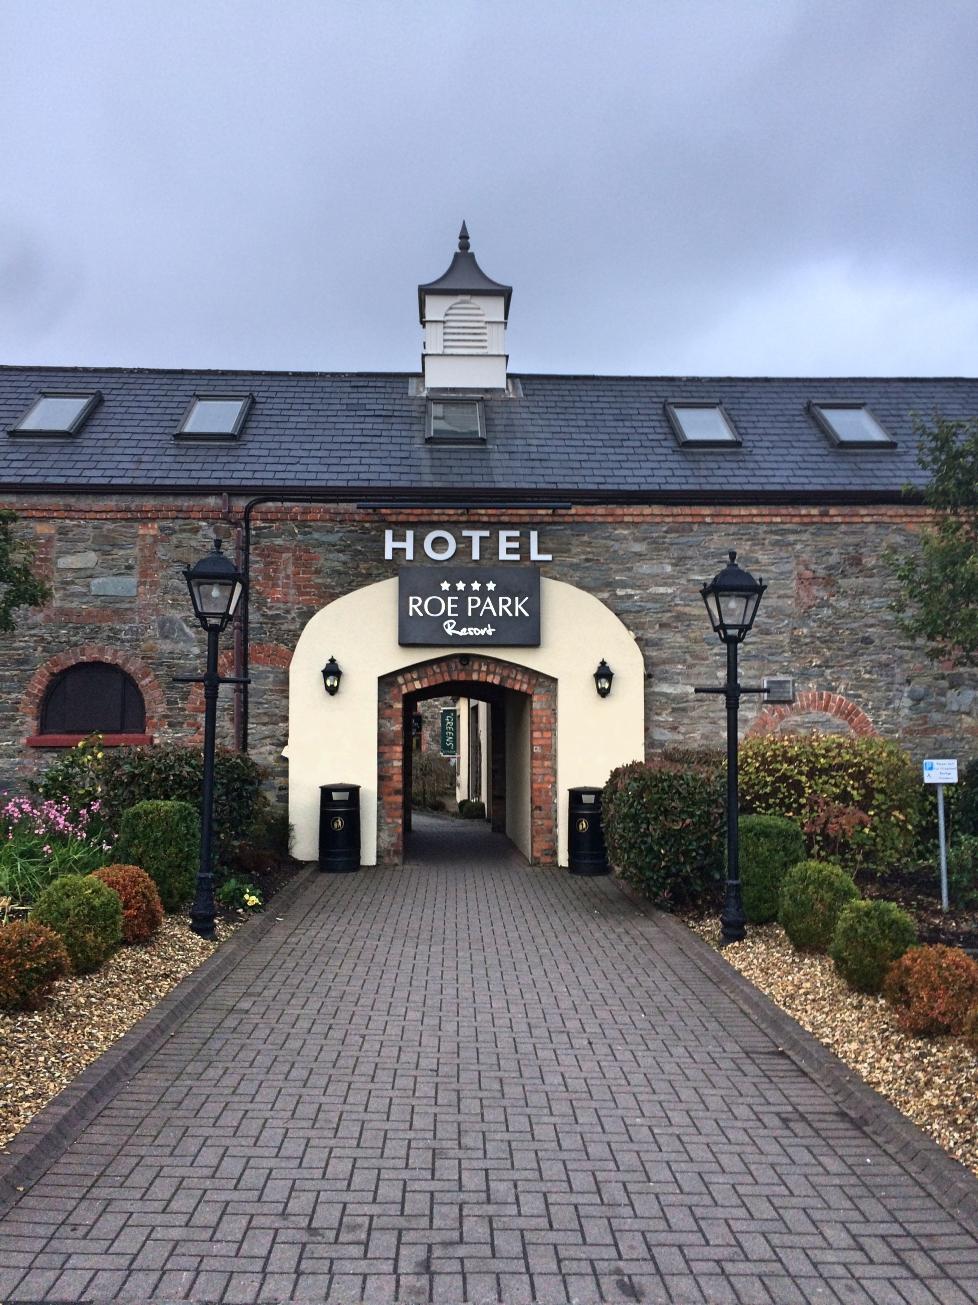 limavady_roe_park_resort_hotel_niexplorer_ni_explorer_northern_ireland (38).jpg